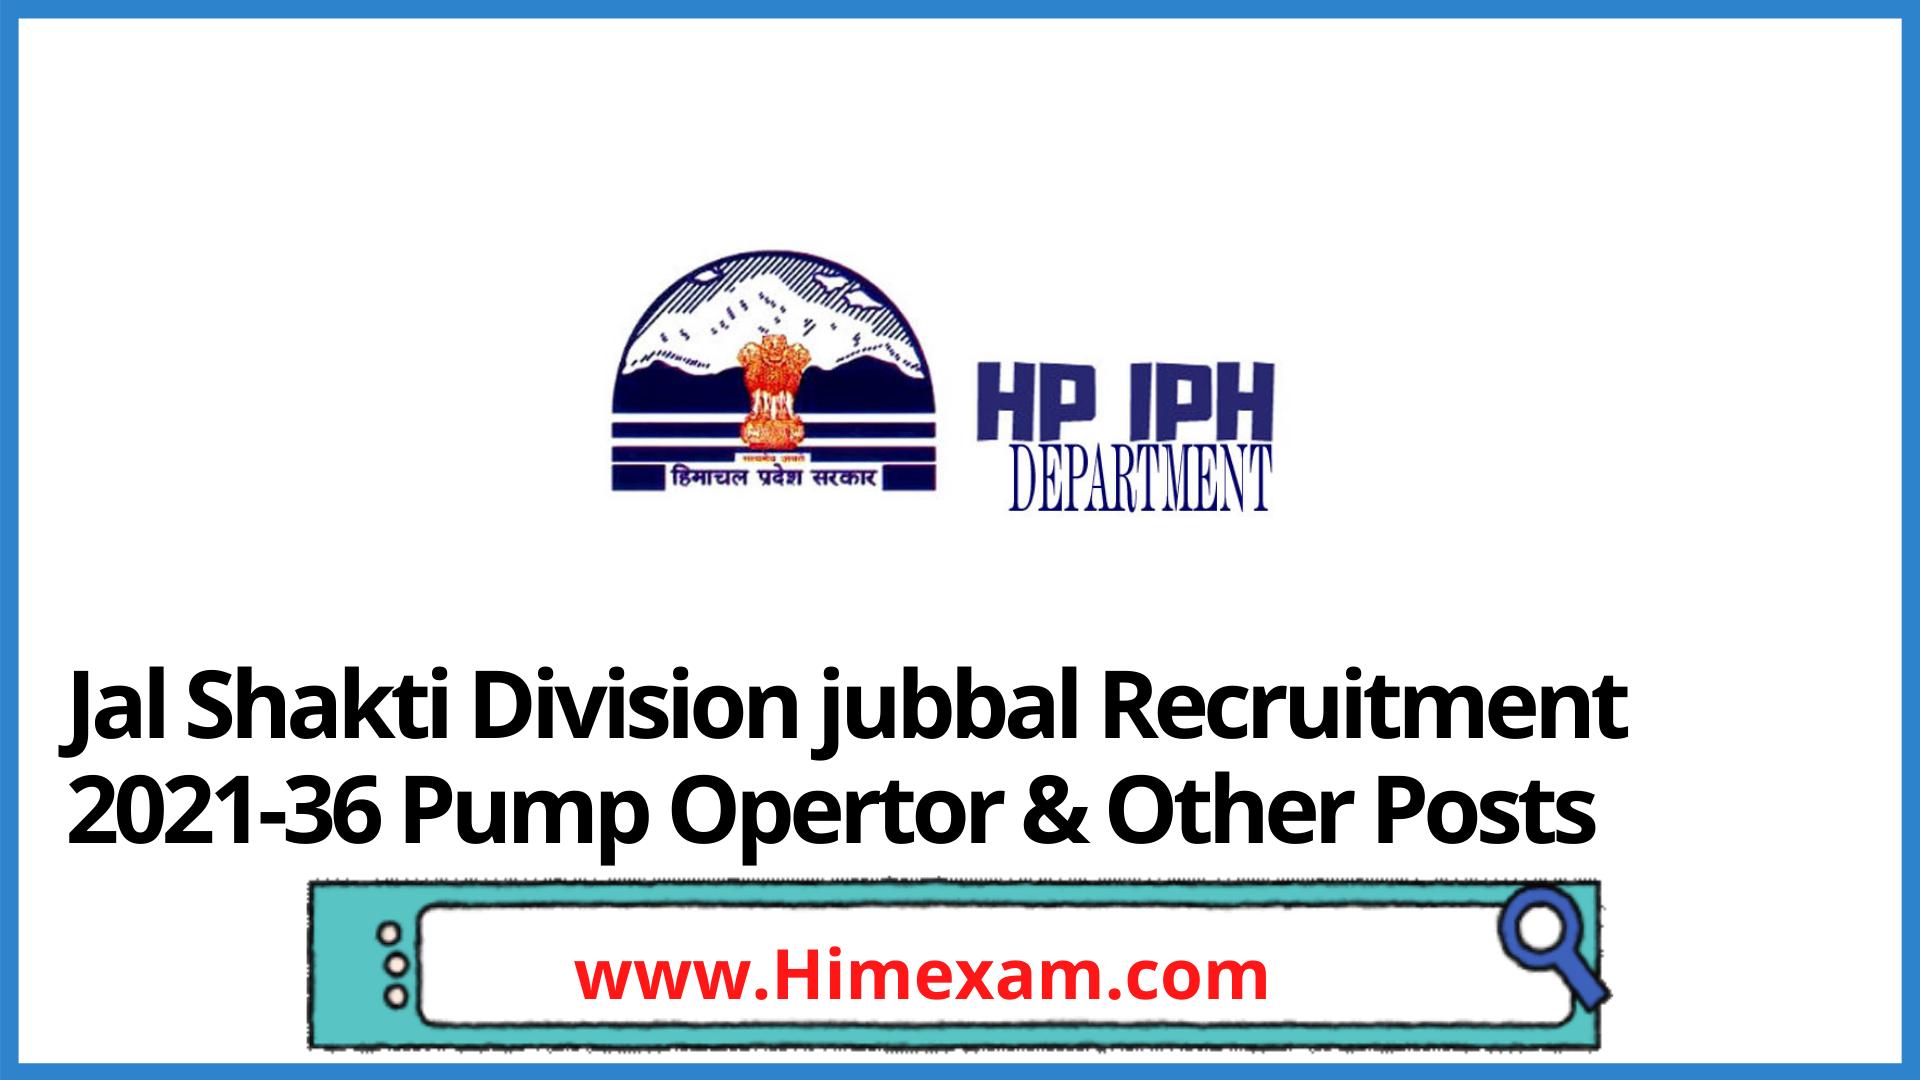 Jal Shakti Division jubbal  Recruitment 2021-36 Pump Opertor & Other Posts